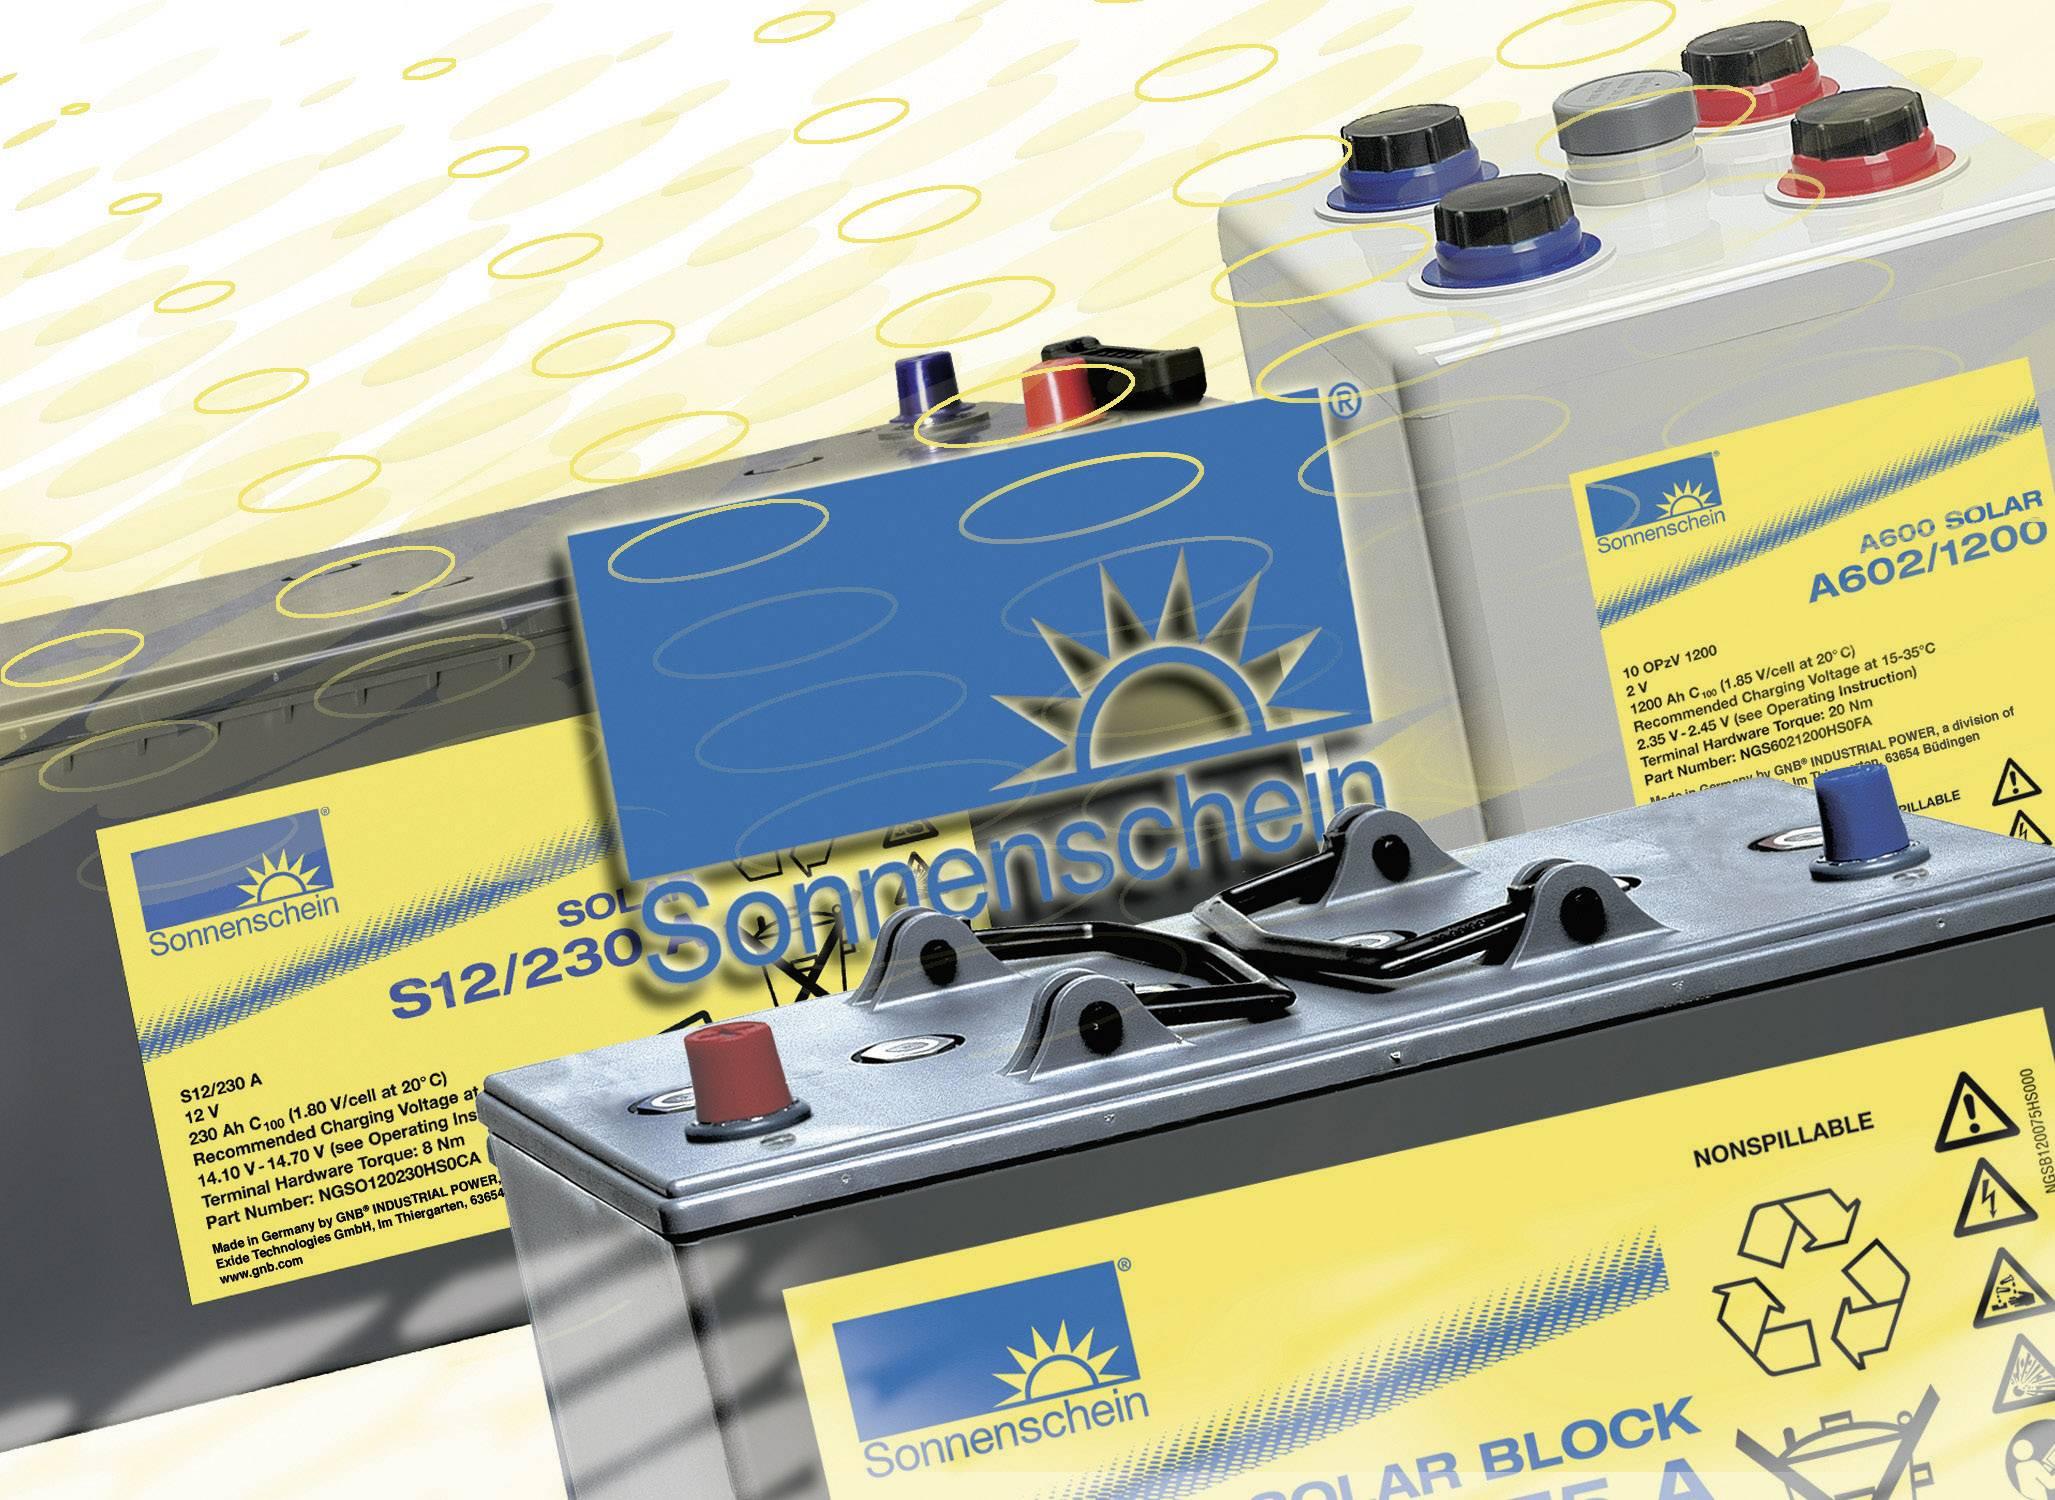 Solárny akumulátor GNB Sonnenschein S12/27 G5 8819861000, 12 V, 27 Ah